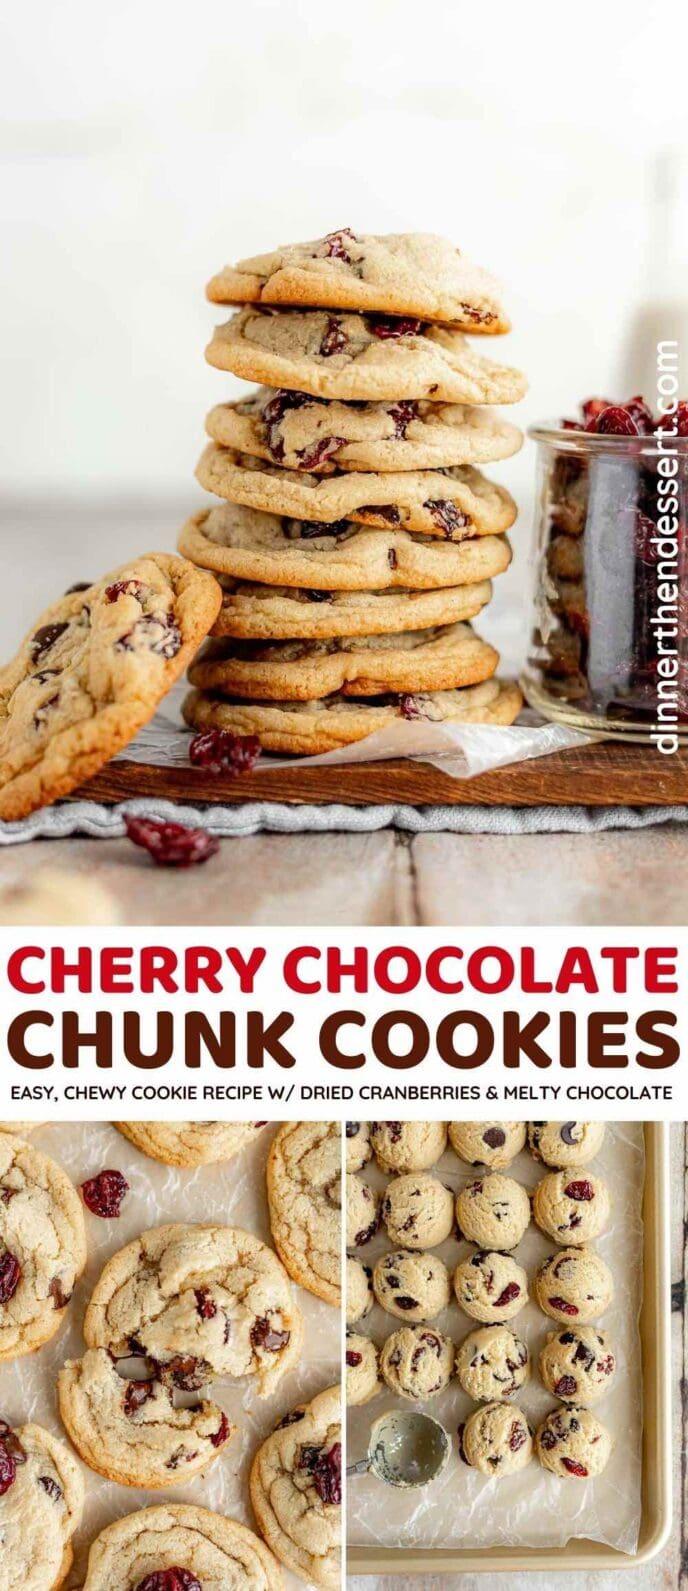 Cherry Chocolate Chunk Cookies collage